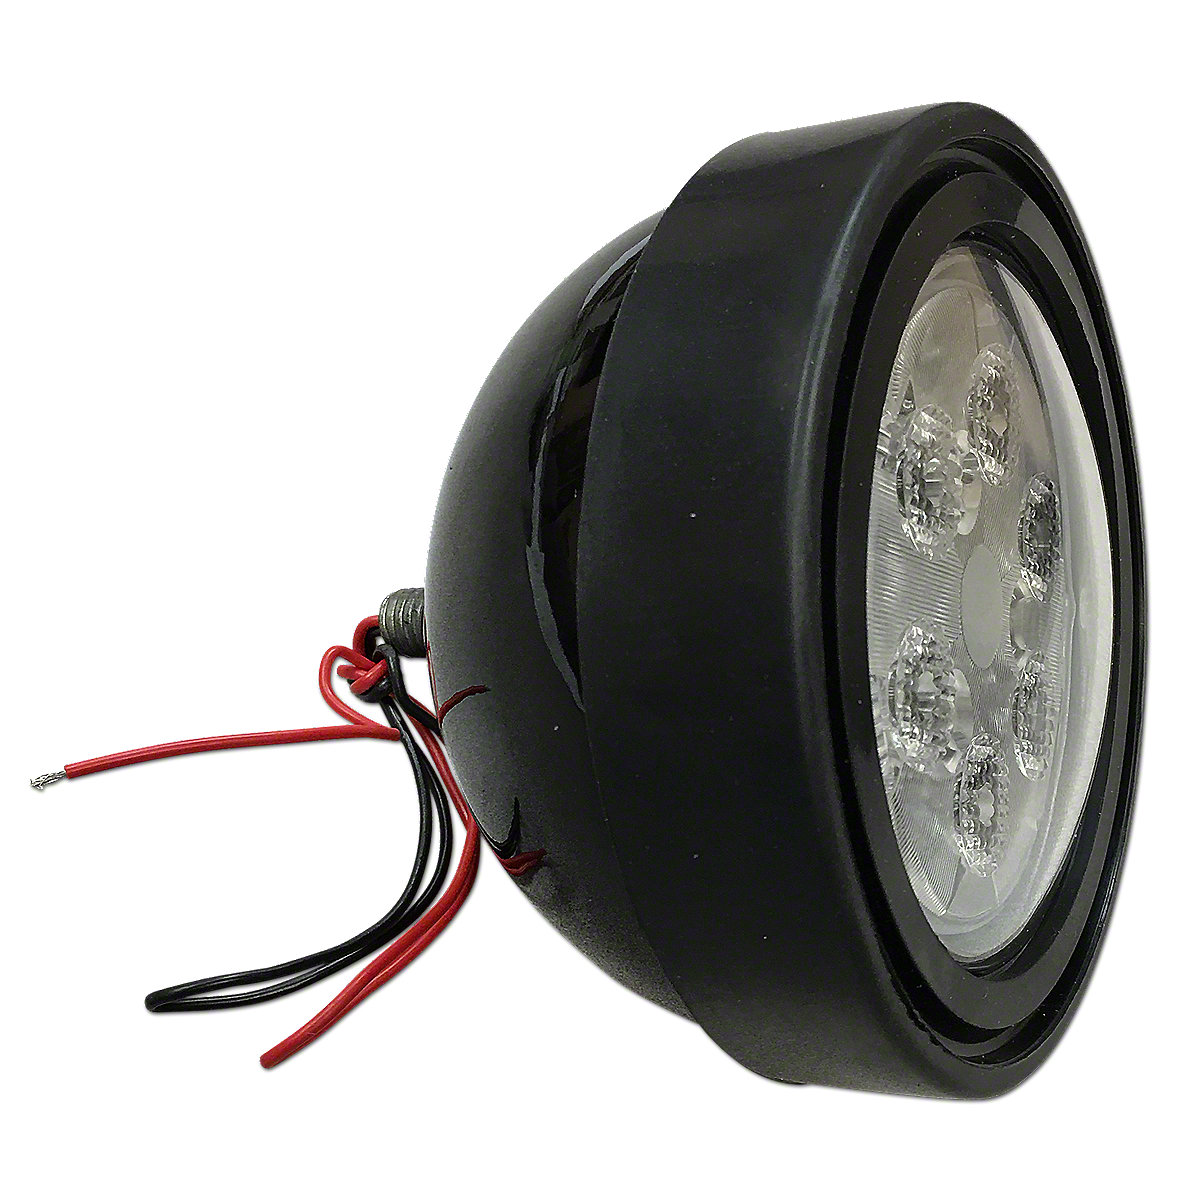 ABC350012-Volt LED Flood Light Assembly W/ Rear Mounting Post